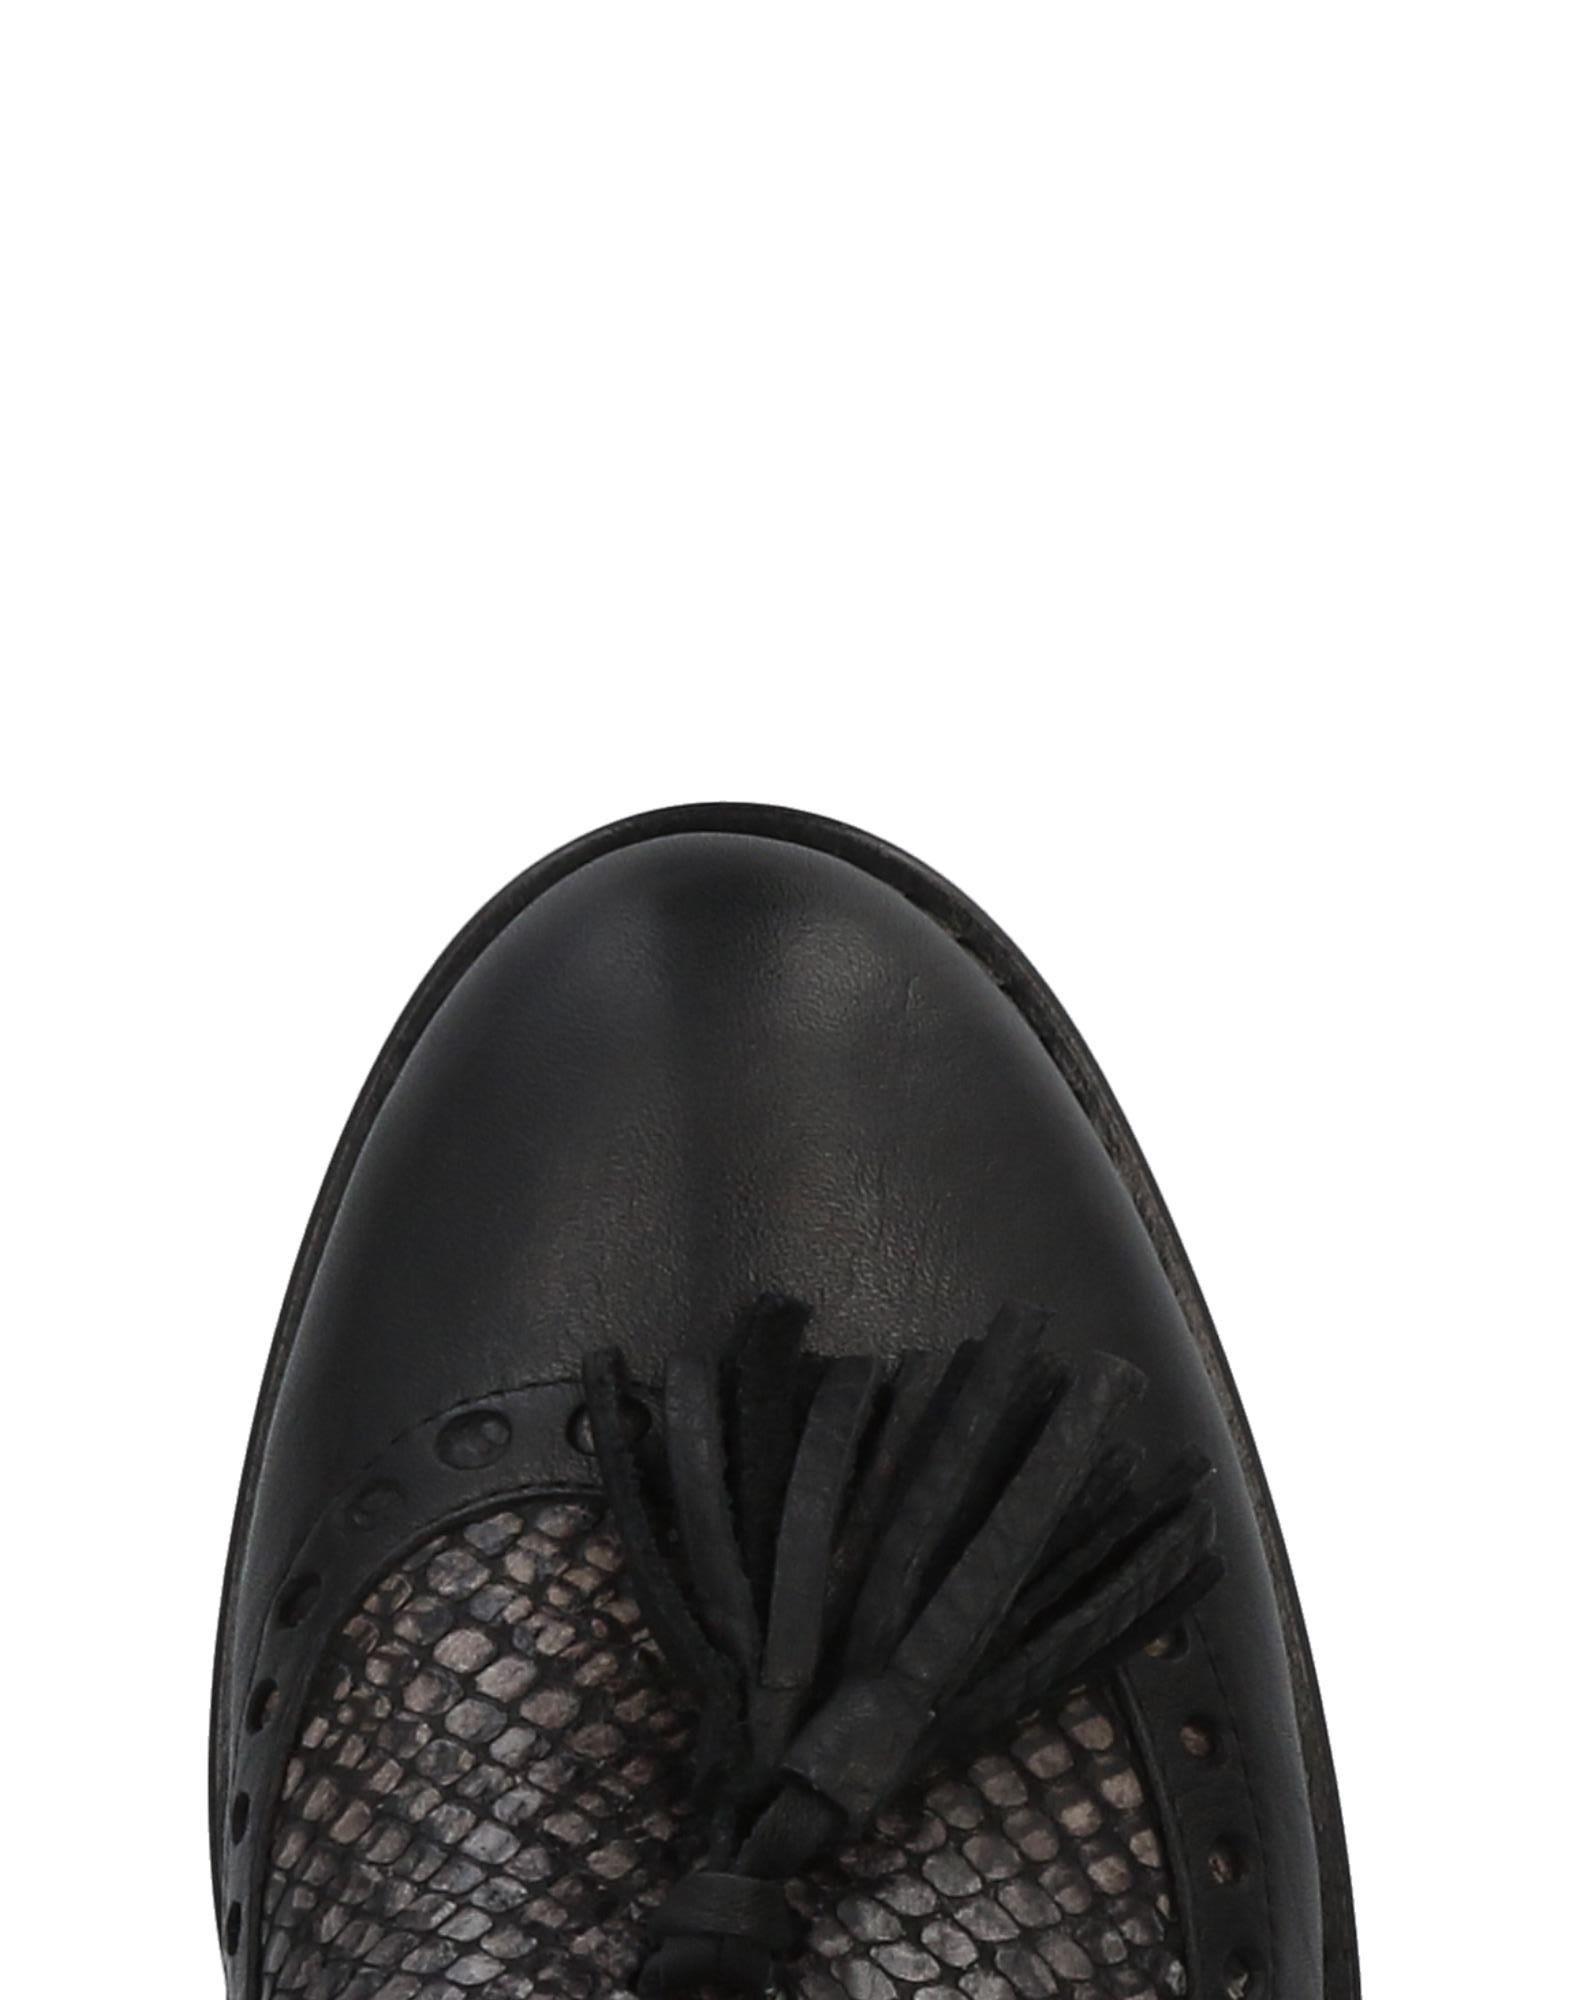 Emanuela Passeri Mokassins Damen  11444389LM Gute Qualität beliebte Schuhe